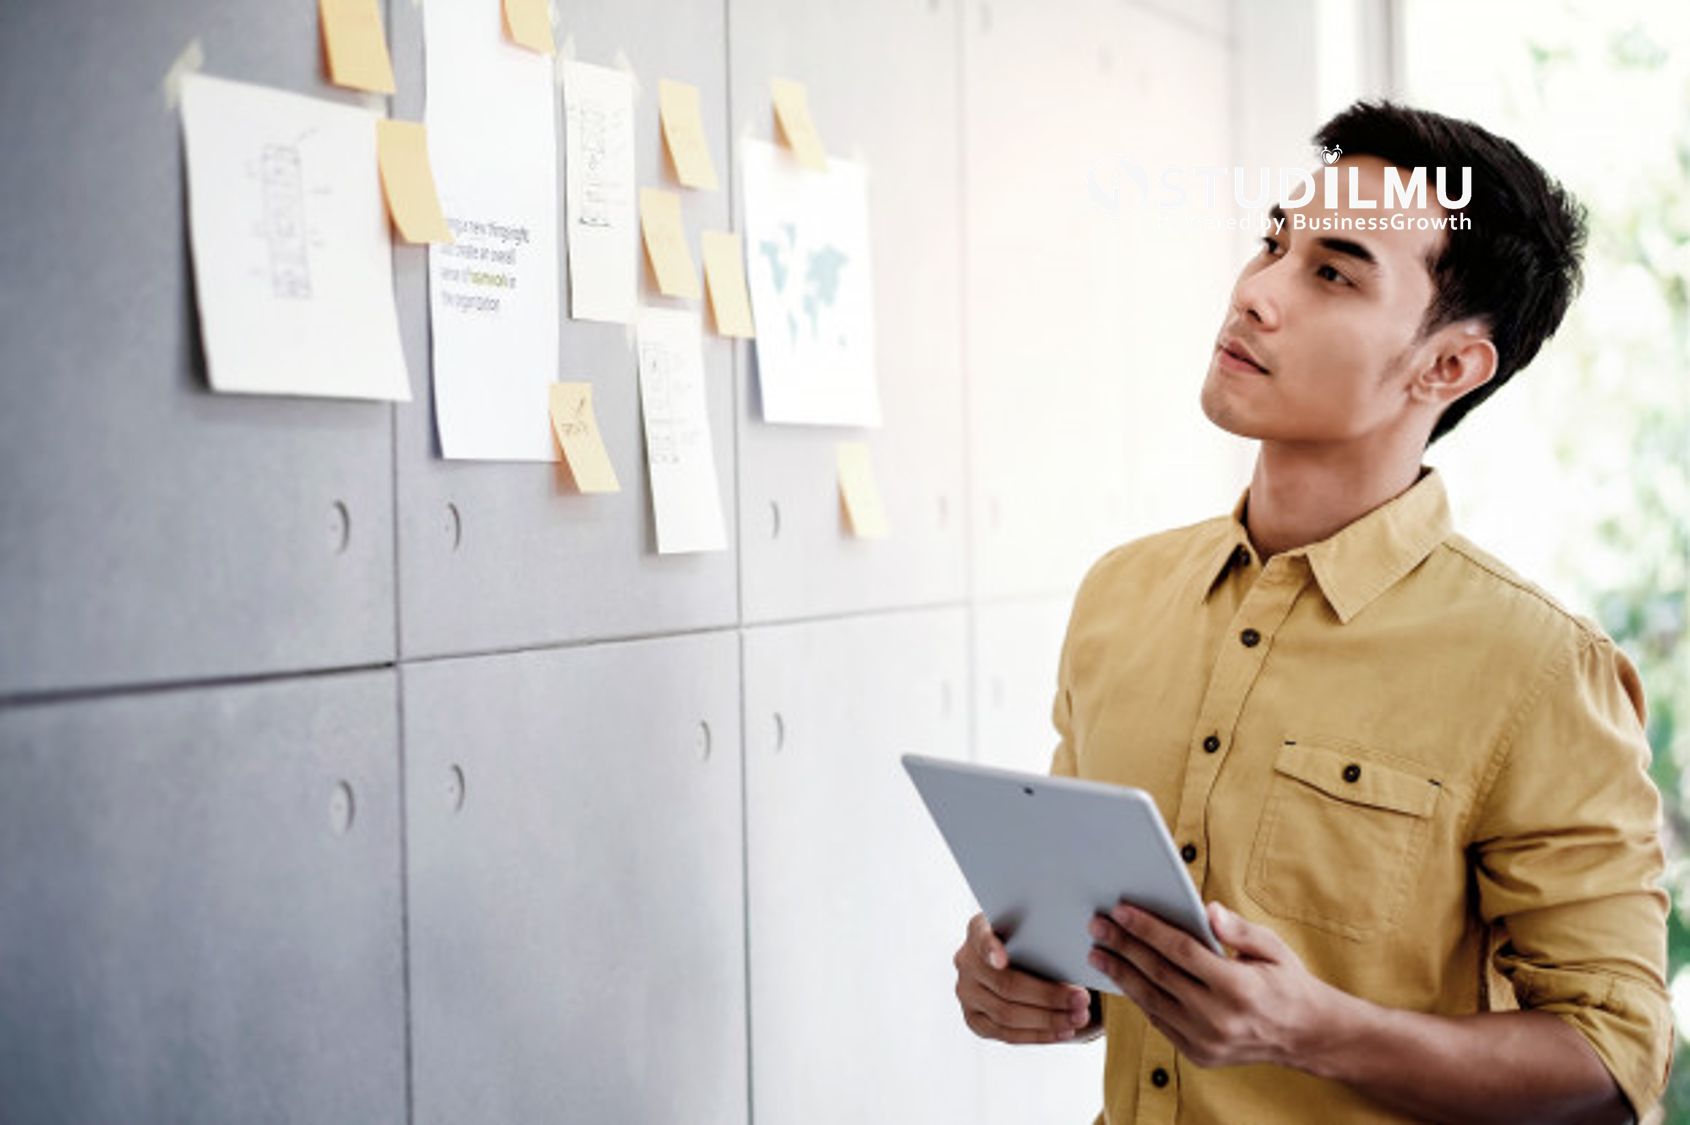 STUDILMU Career Advice - 2 Kunci Sukses Menjalankan Usaha Kecil